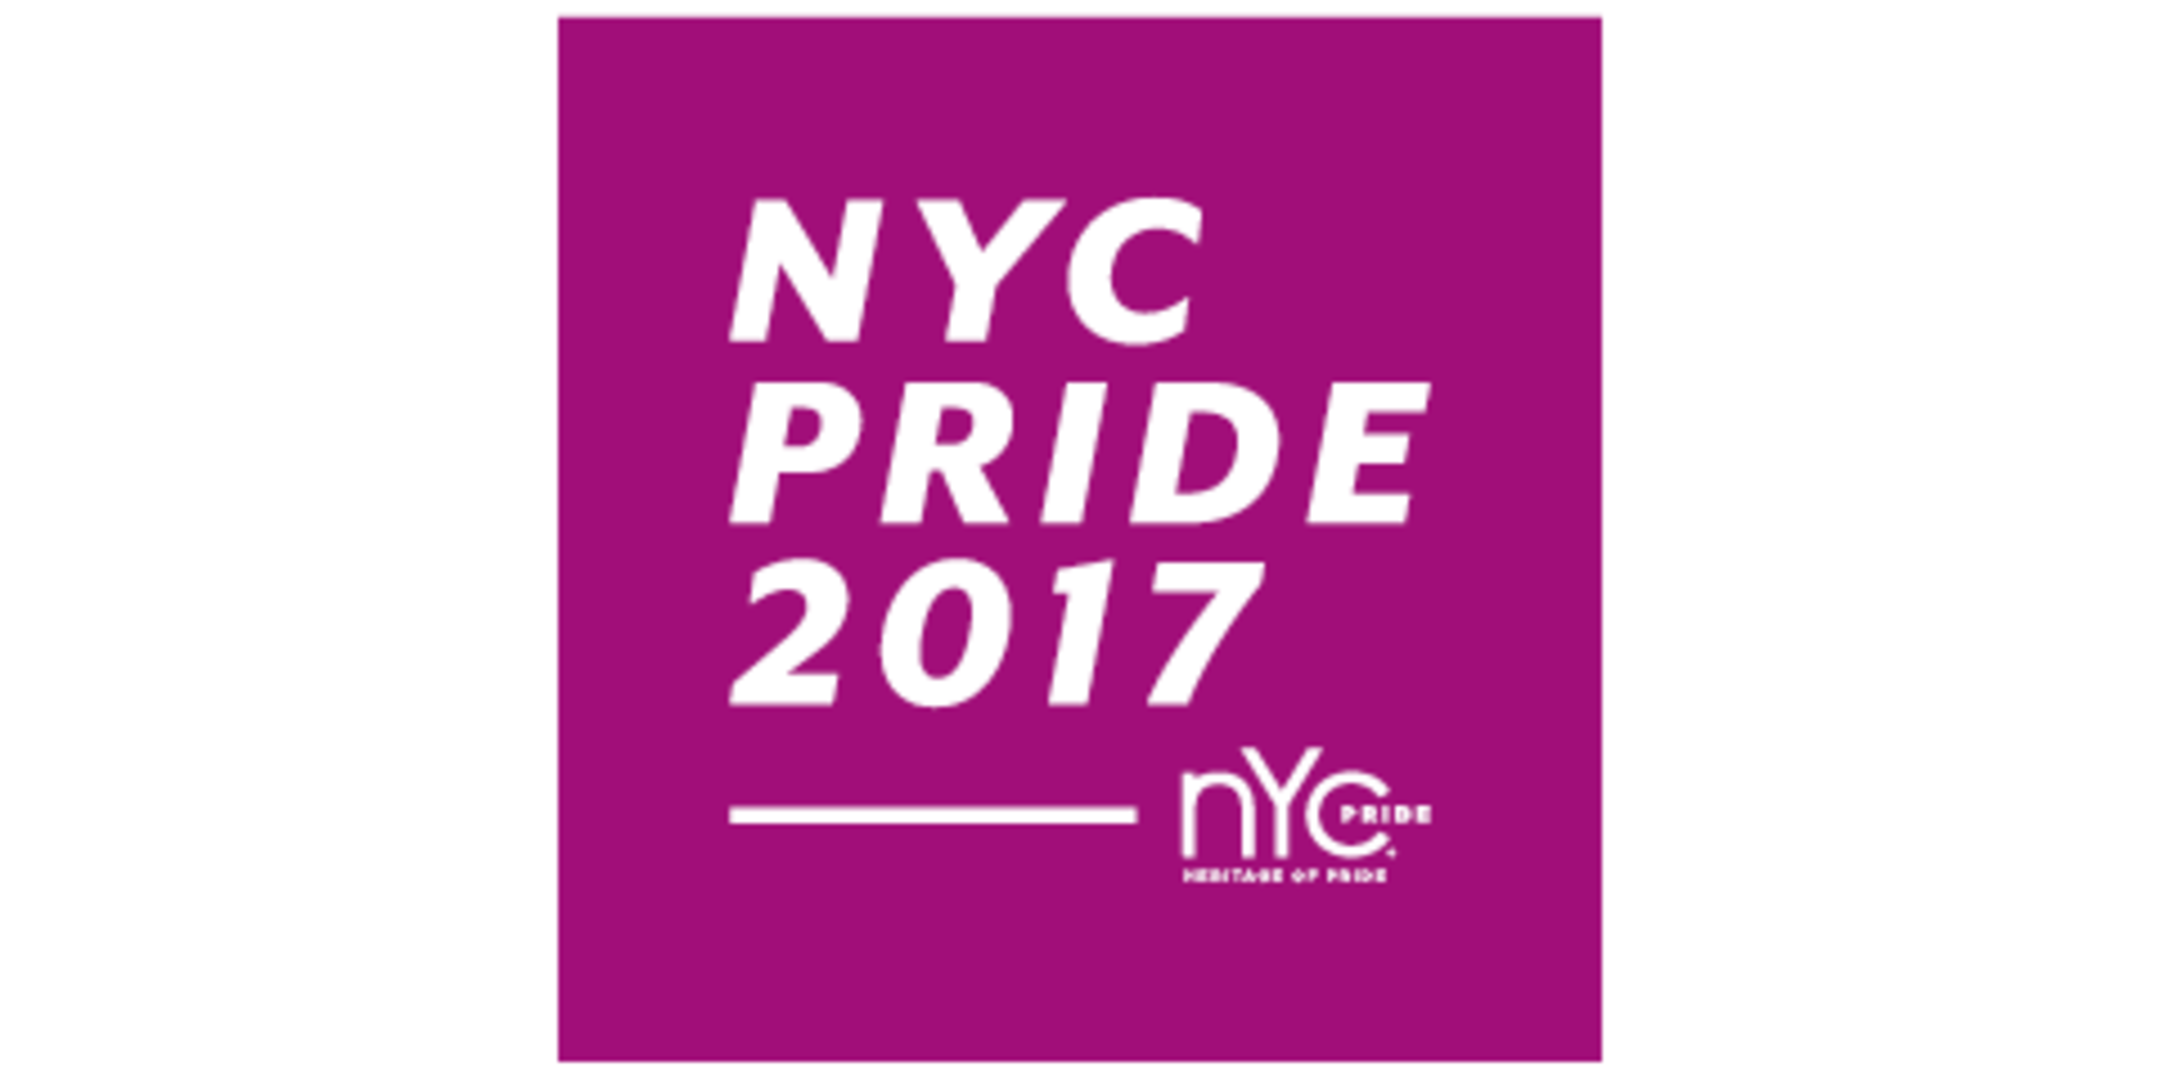 NYC Pride | 2017 March